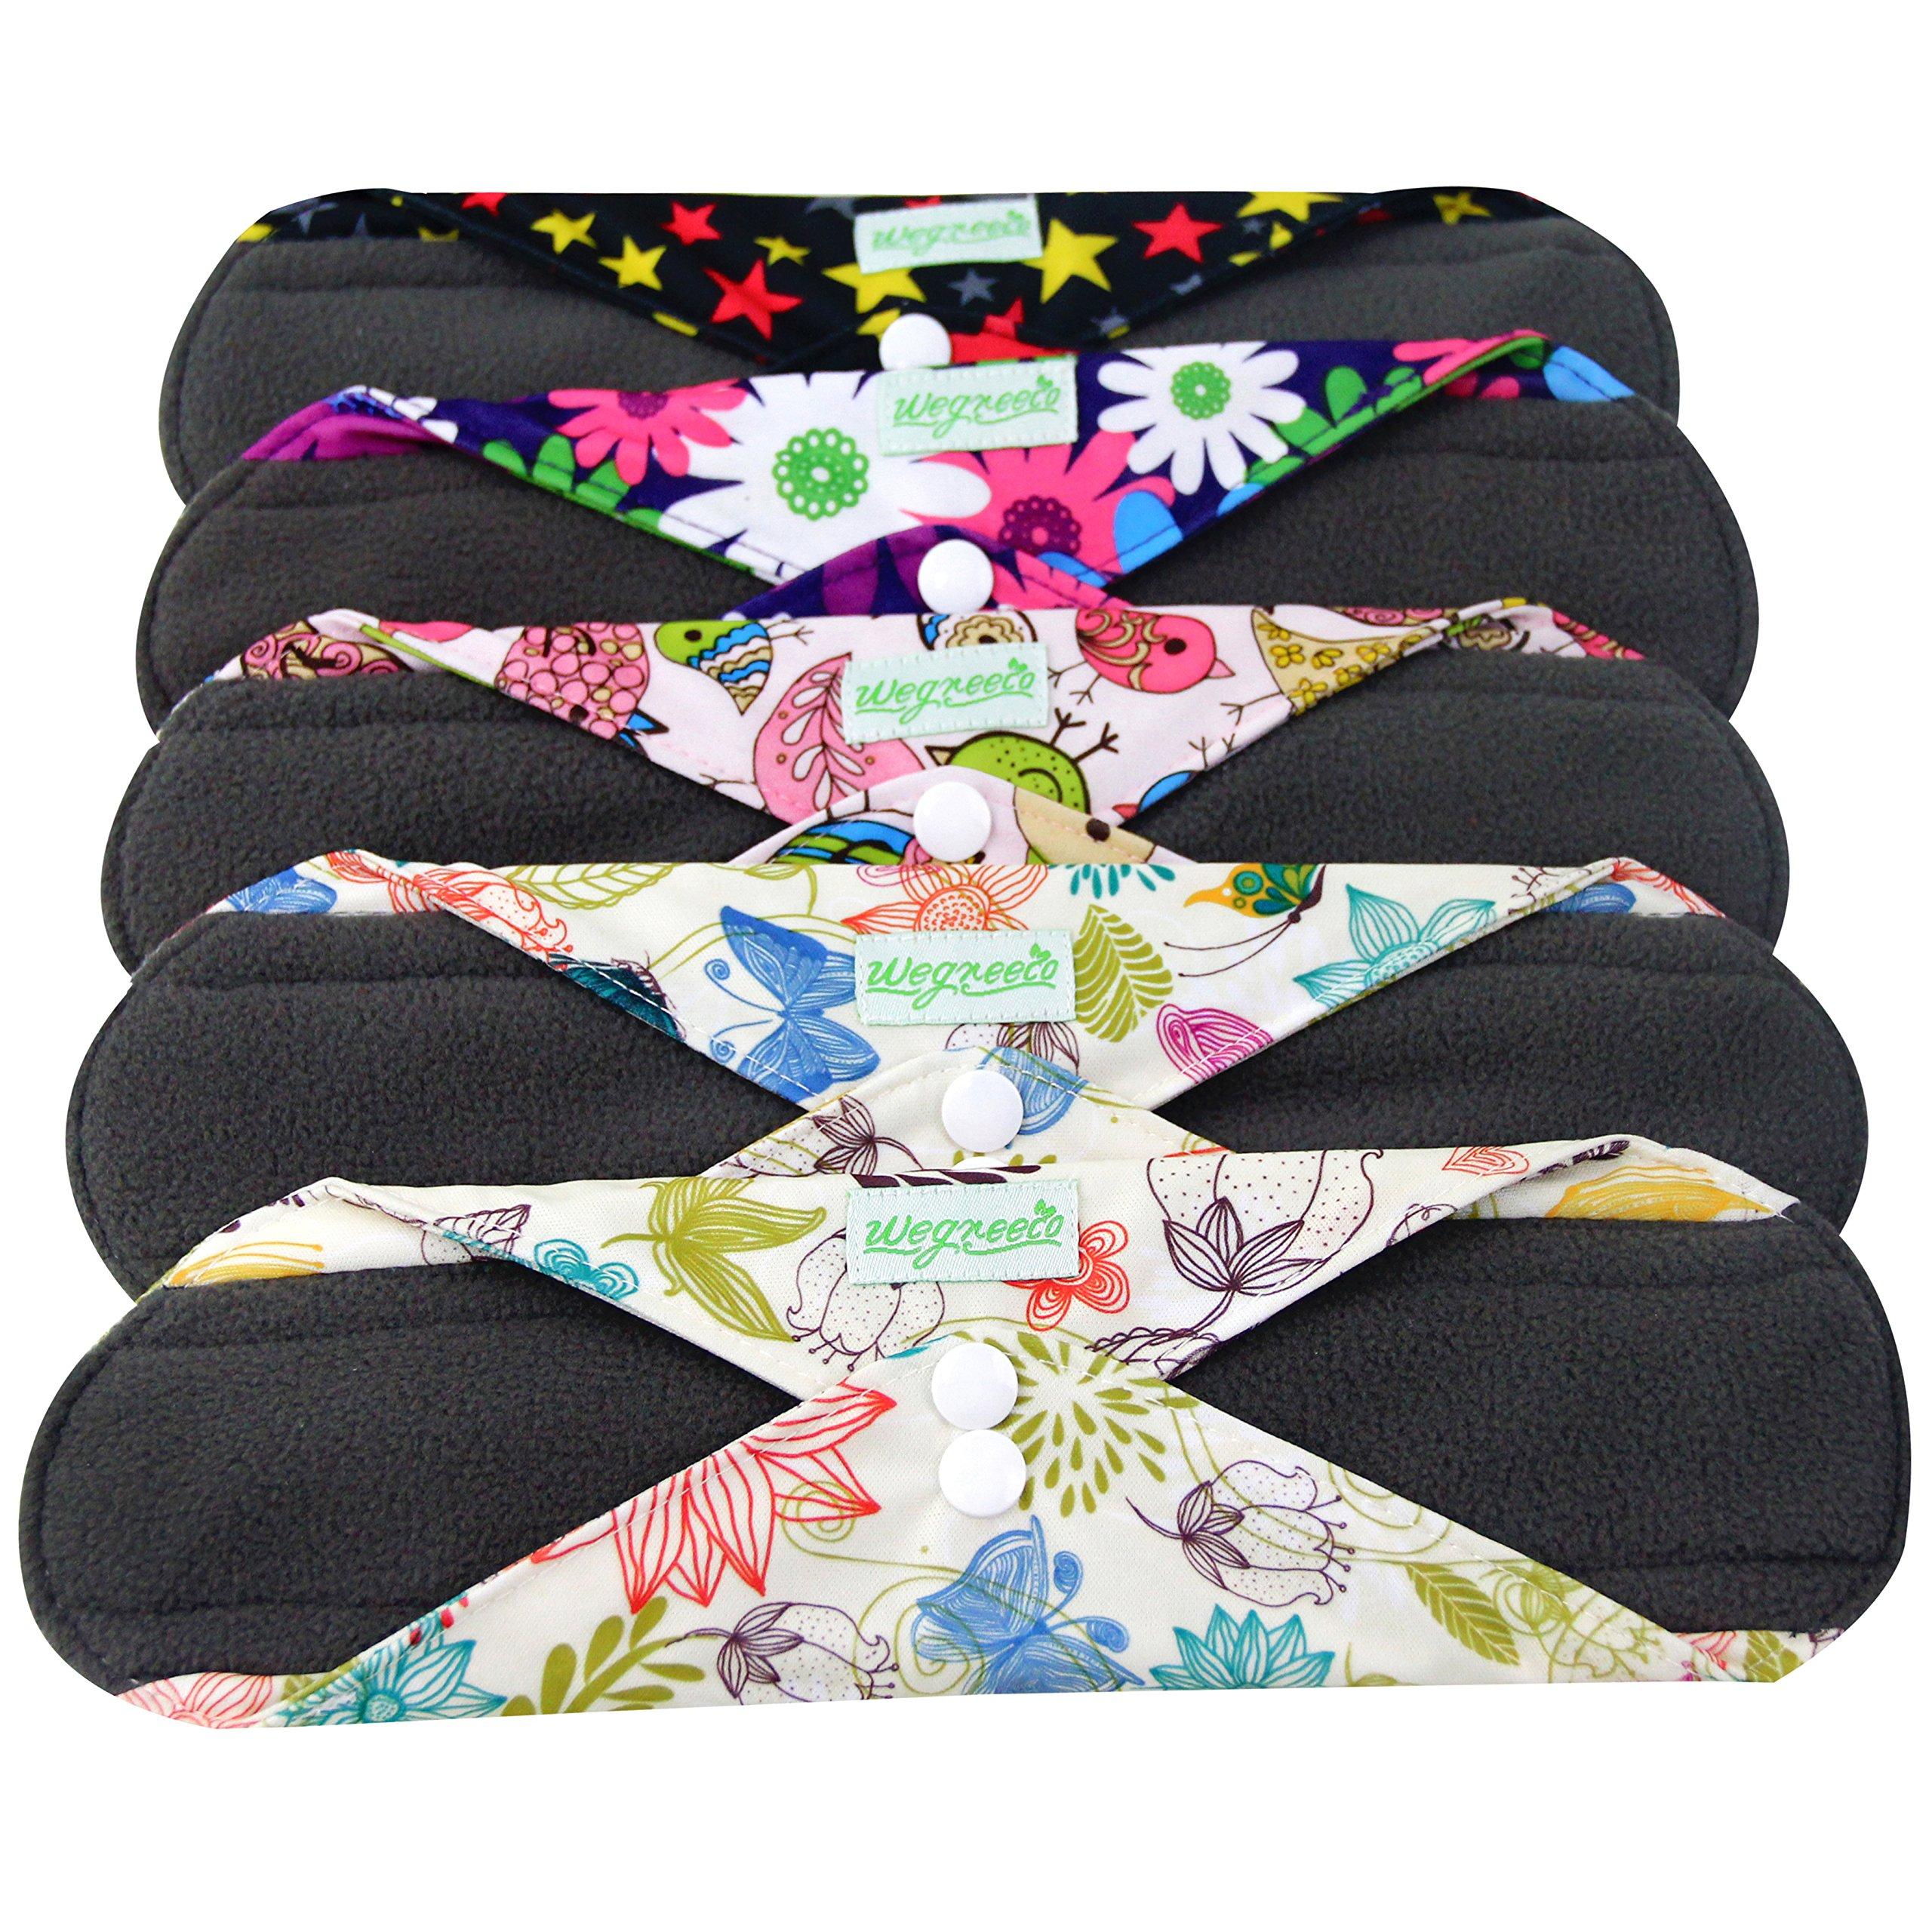 Wegreeco Bamboo Reusable Sanitary Pads - Cloth Sanitary Pads - Pack of 5 (Small, Mix Prints)